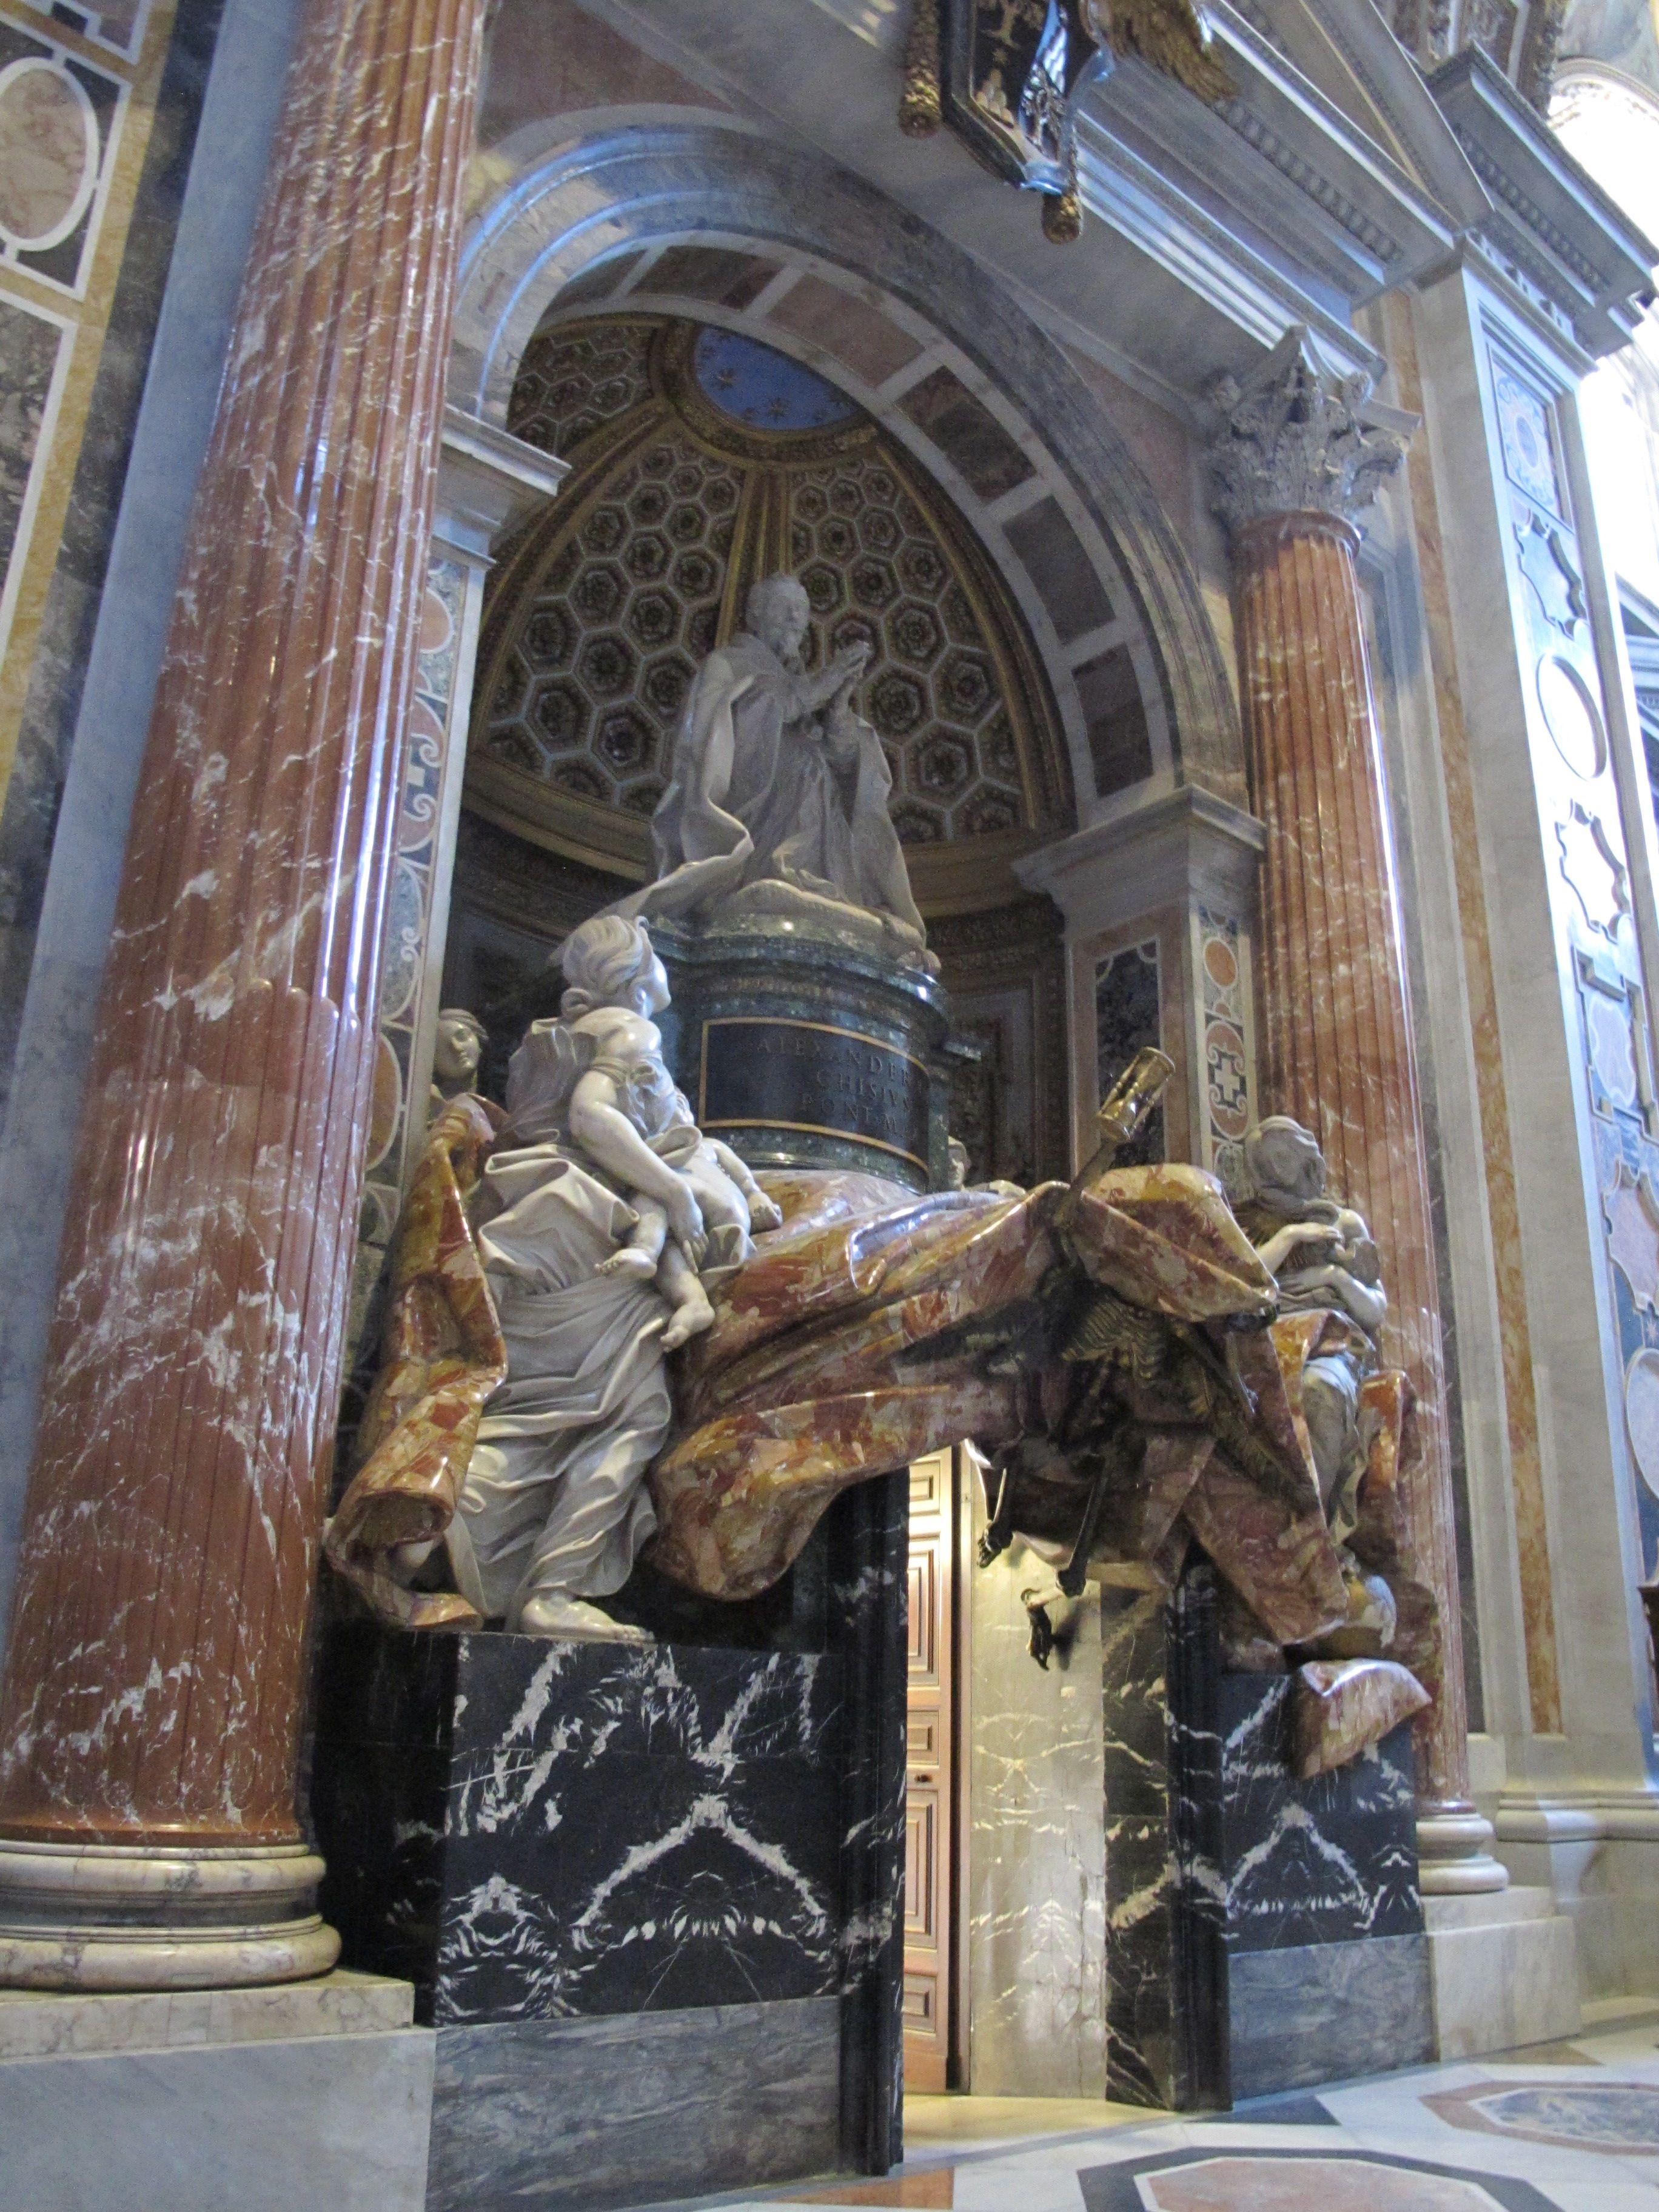 Pope Alexander VII monument, St. Peter's Basilica. St